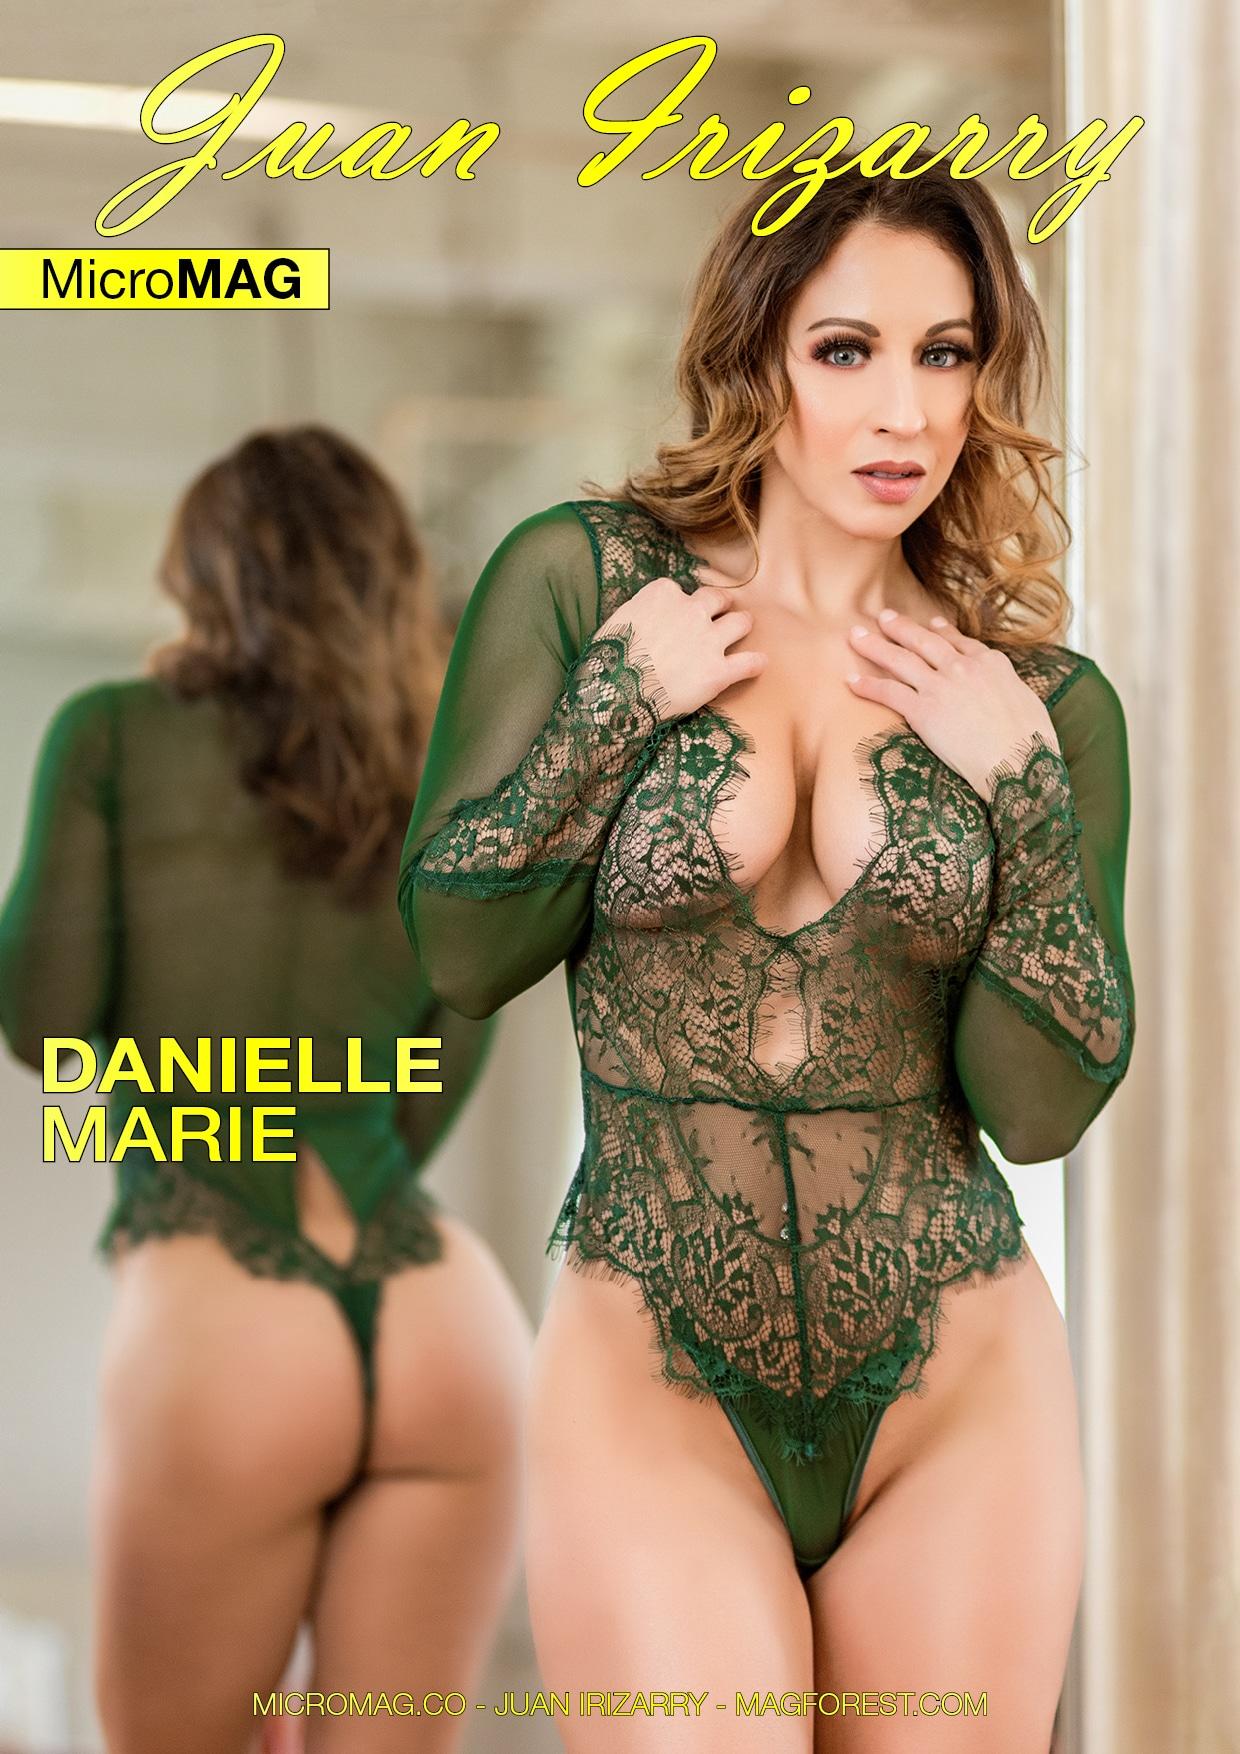 Juan Irizarry MicroMAG - Danielle Marie 1